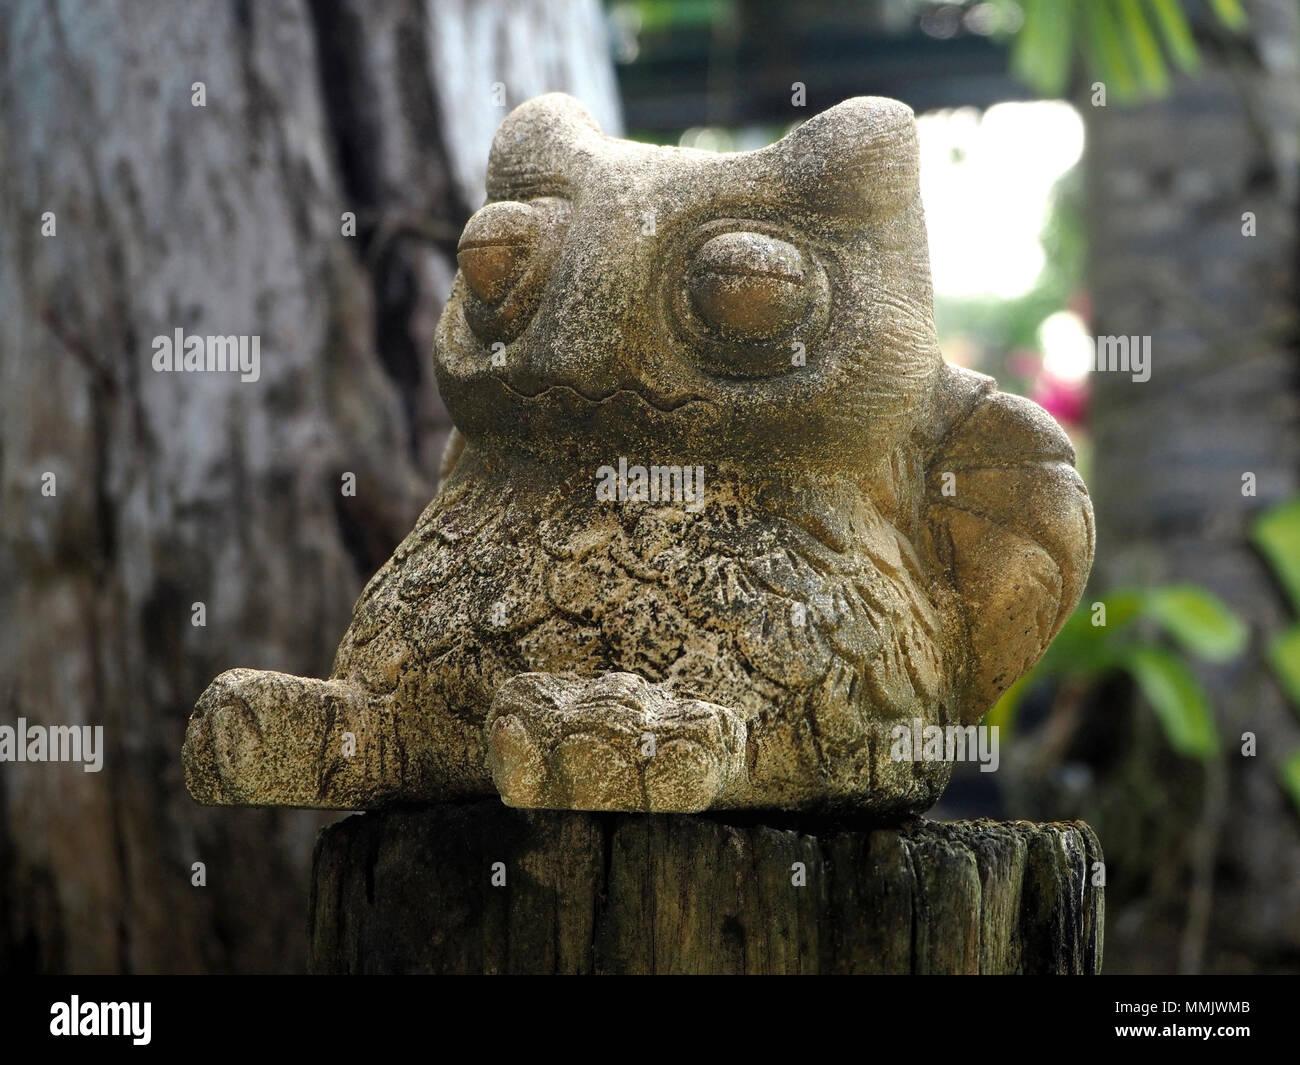 Stone Owl Statue Stock Photos & Stone Owl Statue Stock Images - Alamy